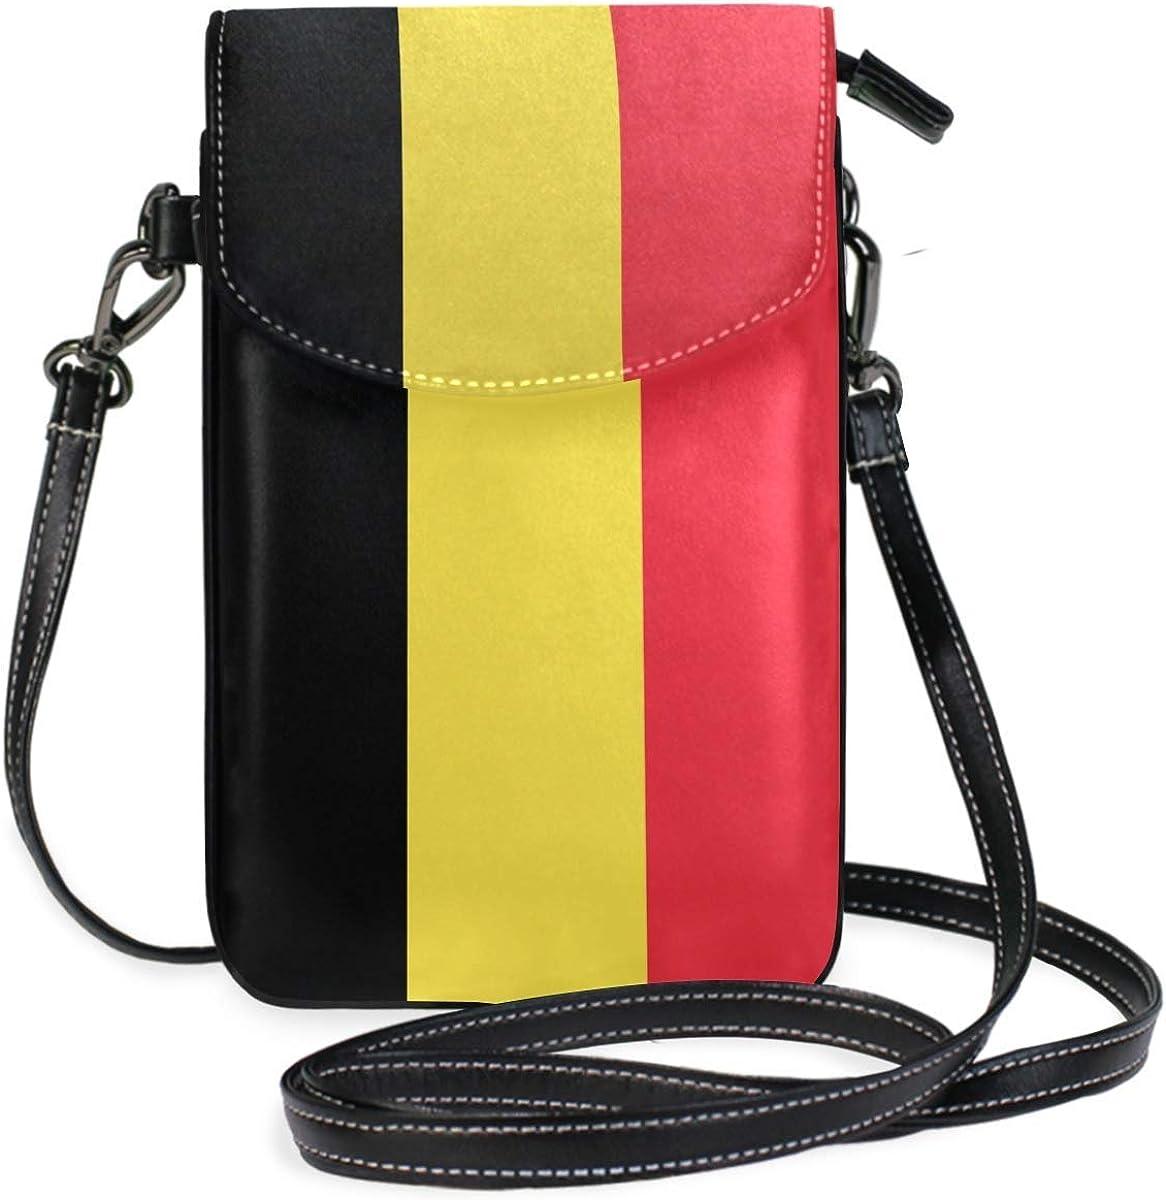 XCNGG Cartera de teléfono móvil oficial de Bélgica con bandera belga para mujer y niña, pequeños bolsos cruzados